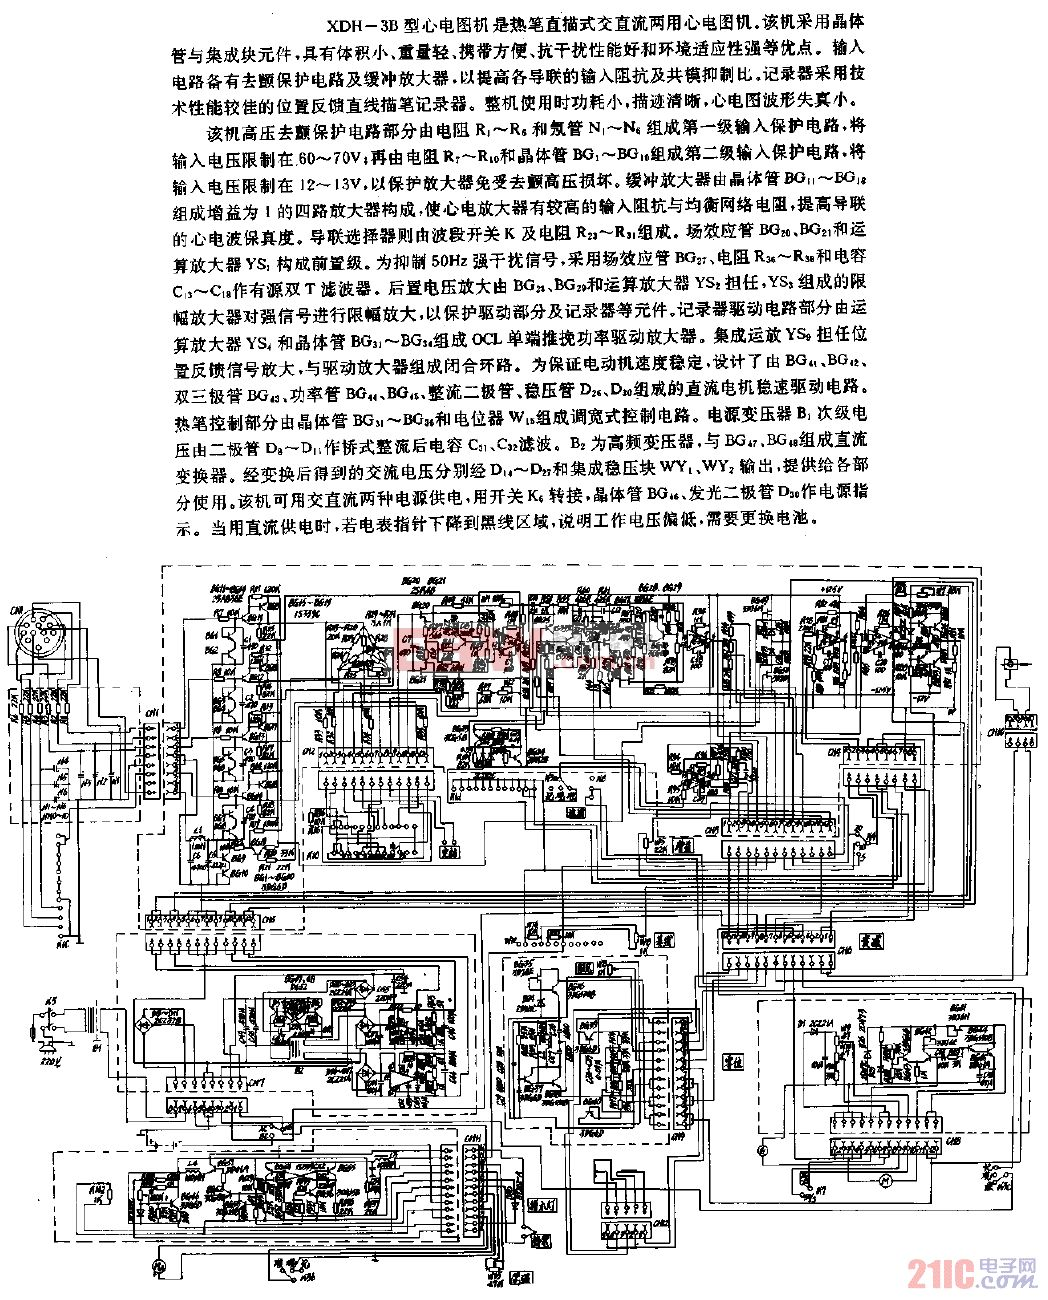 XDH-3B型心电图机电路.gif